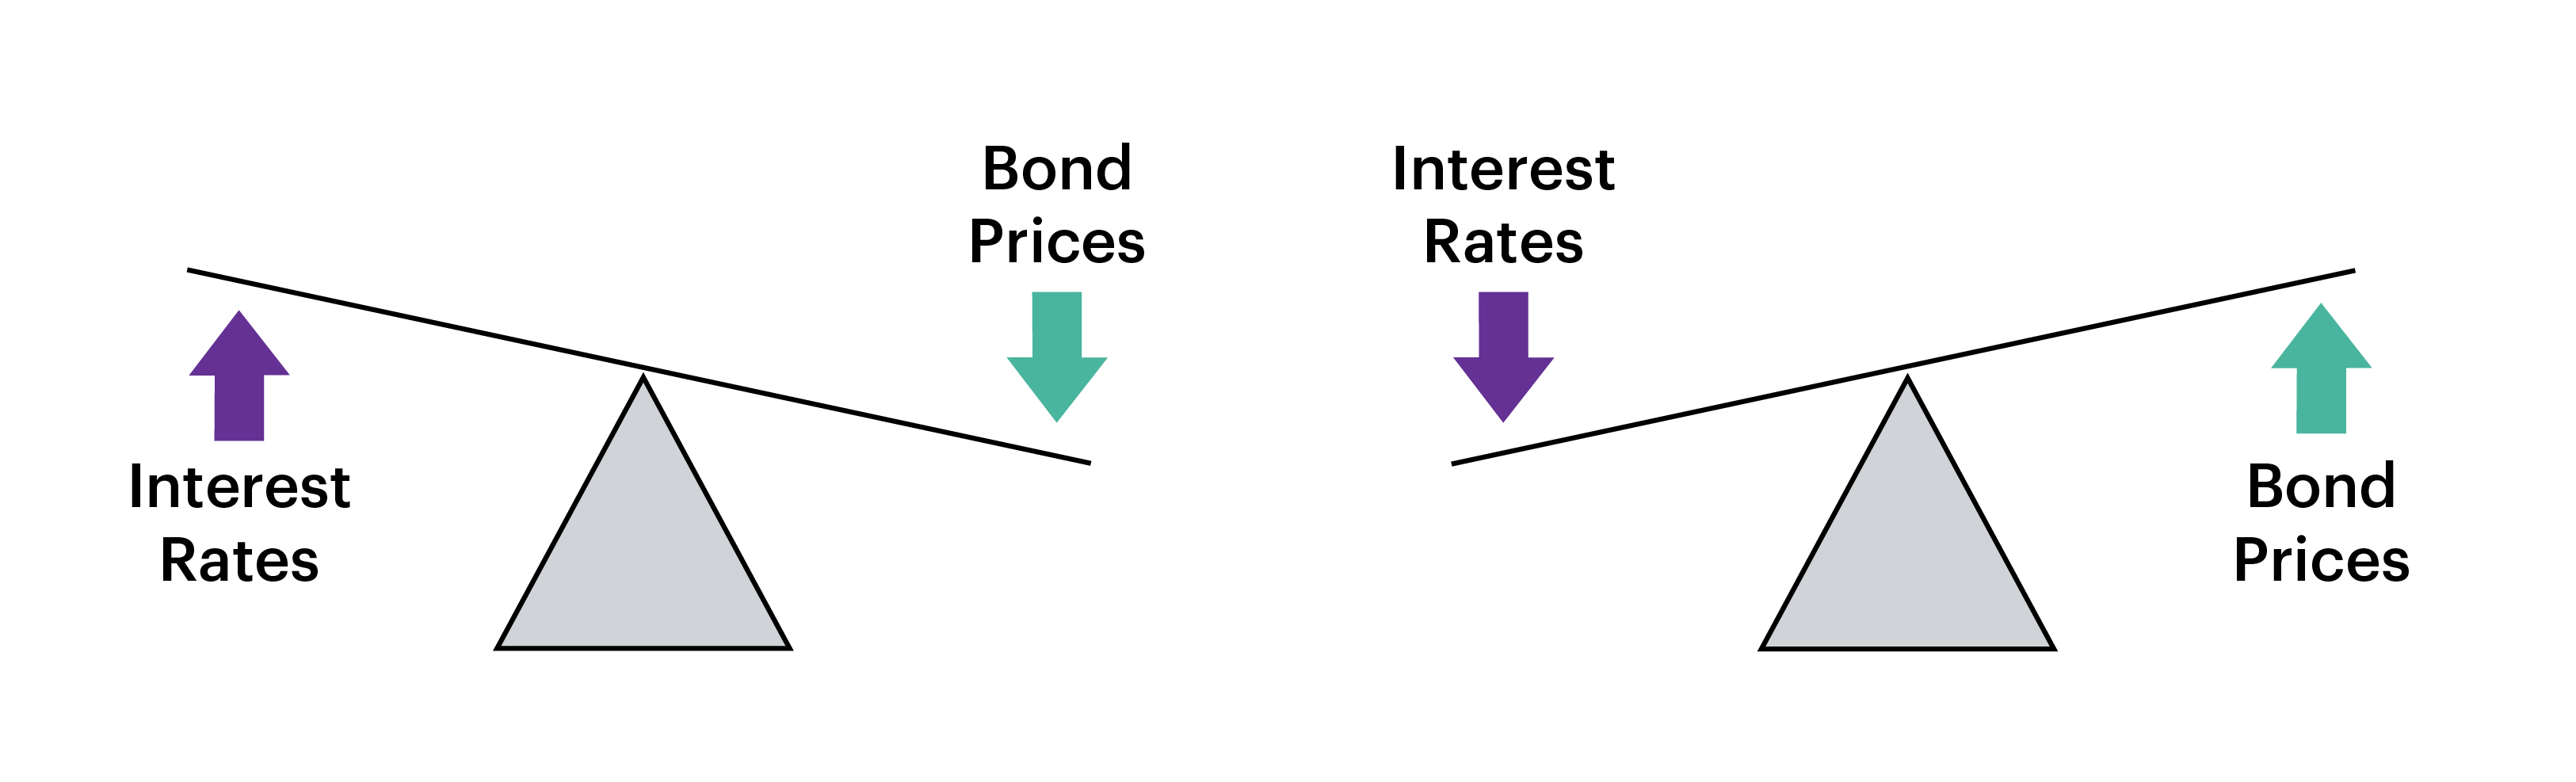 Infographic - interest rates v bond prices seesaw